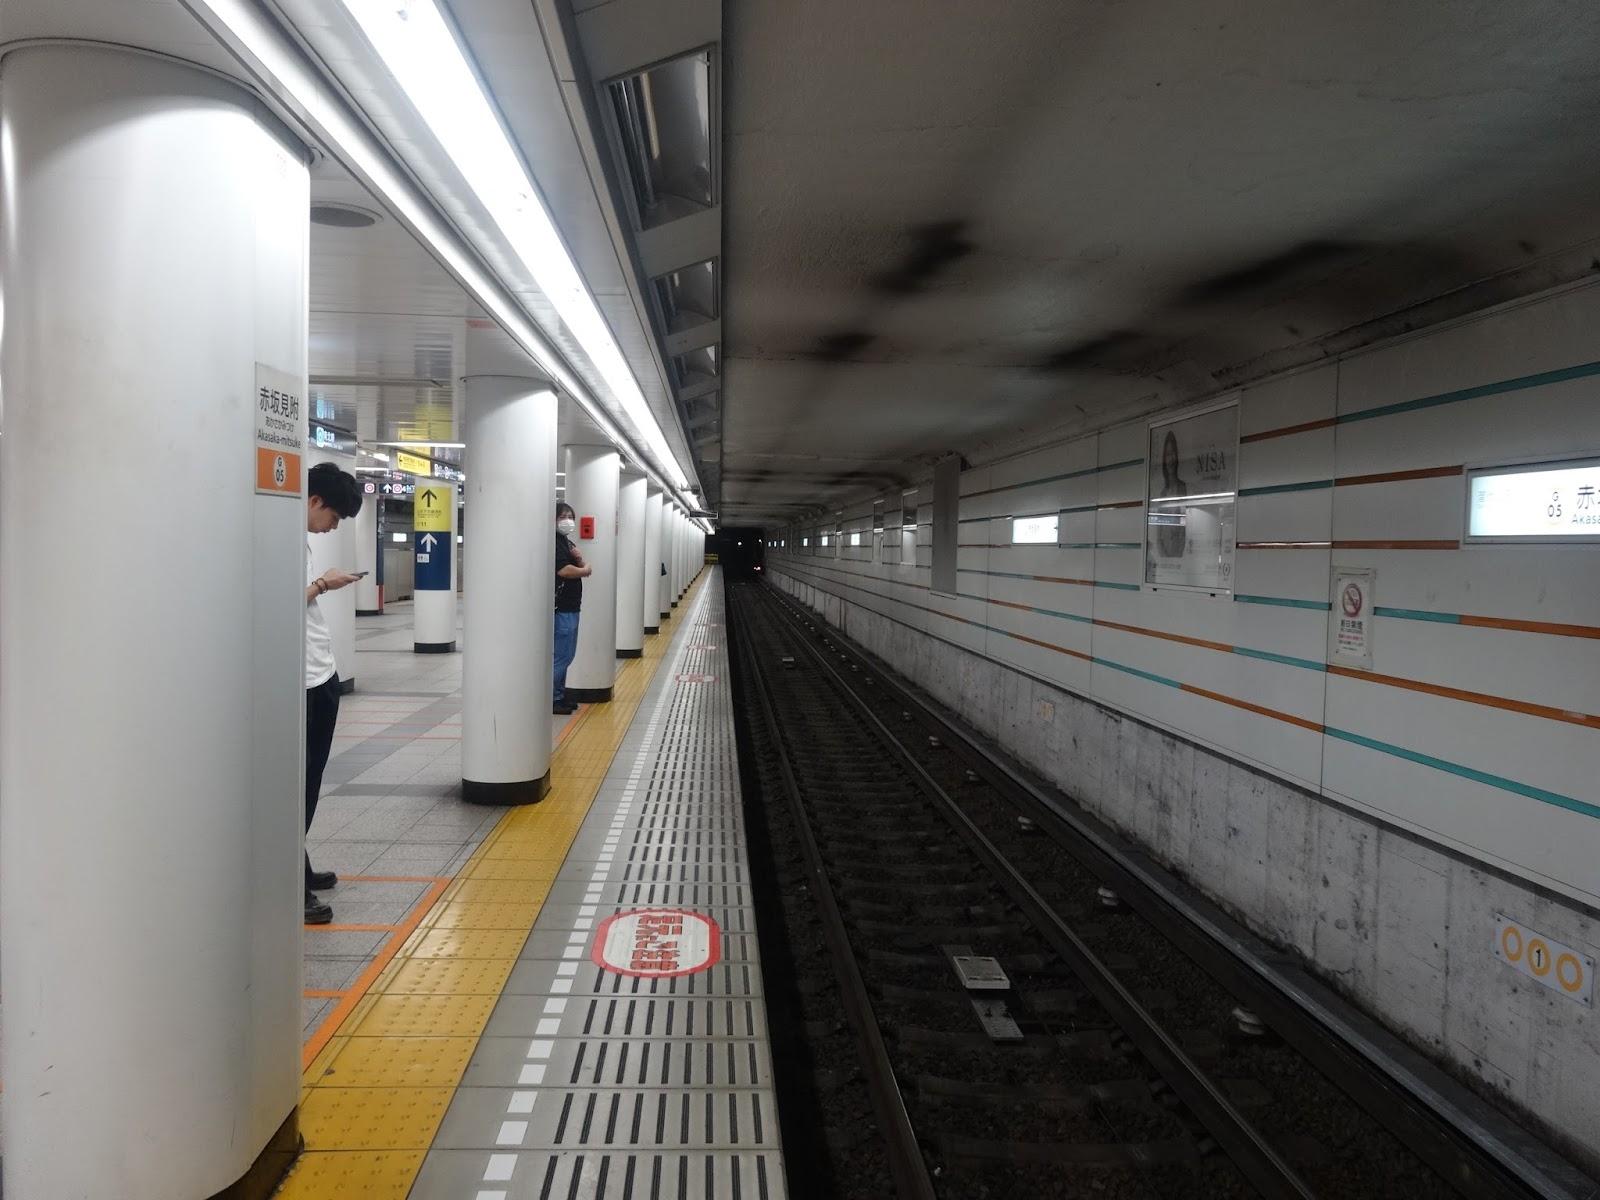 駅ホーム,赤坂見附駅,地下鉄銀座線〈著作権フリー無料画像〉Free Stock Photos